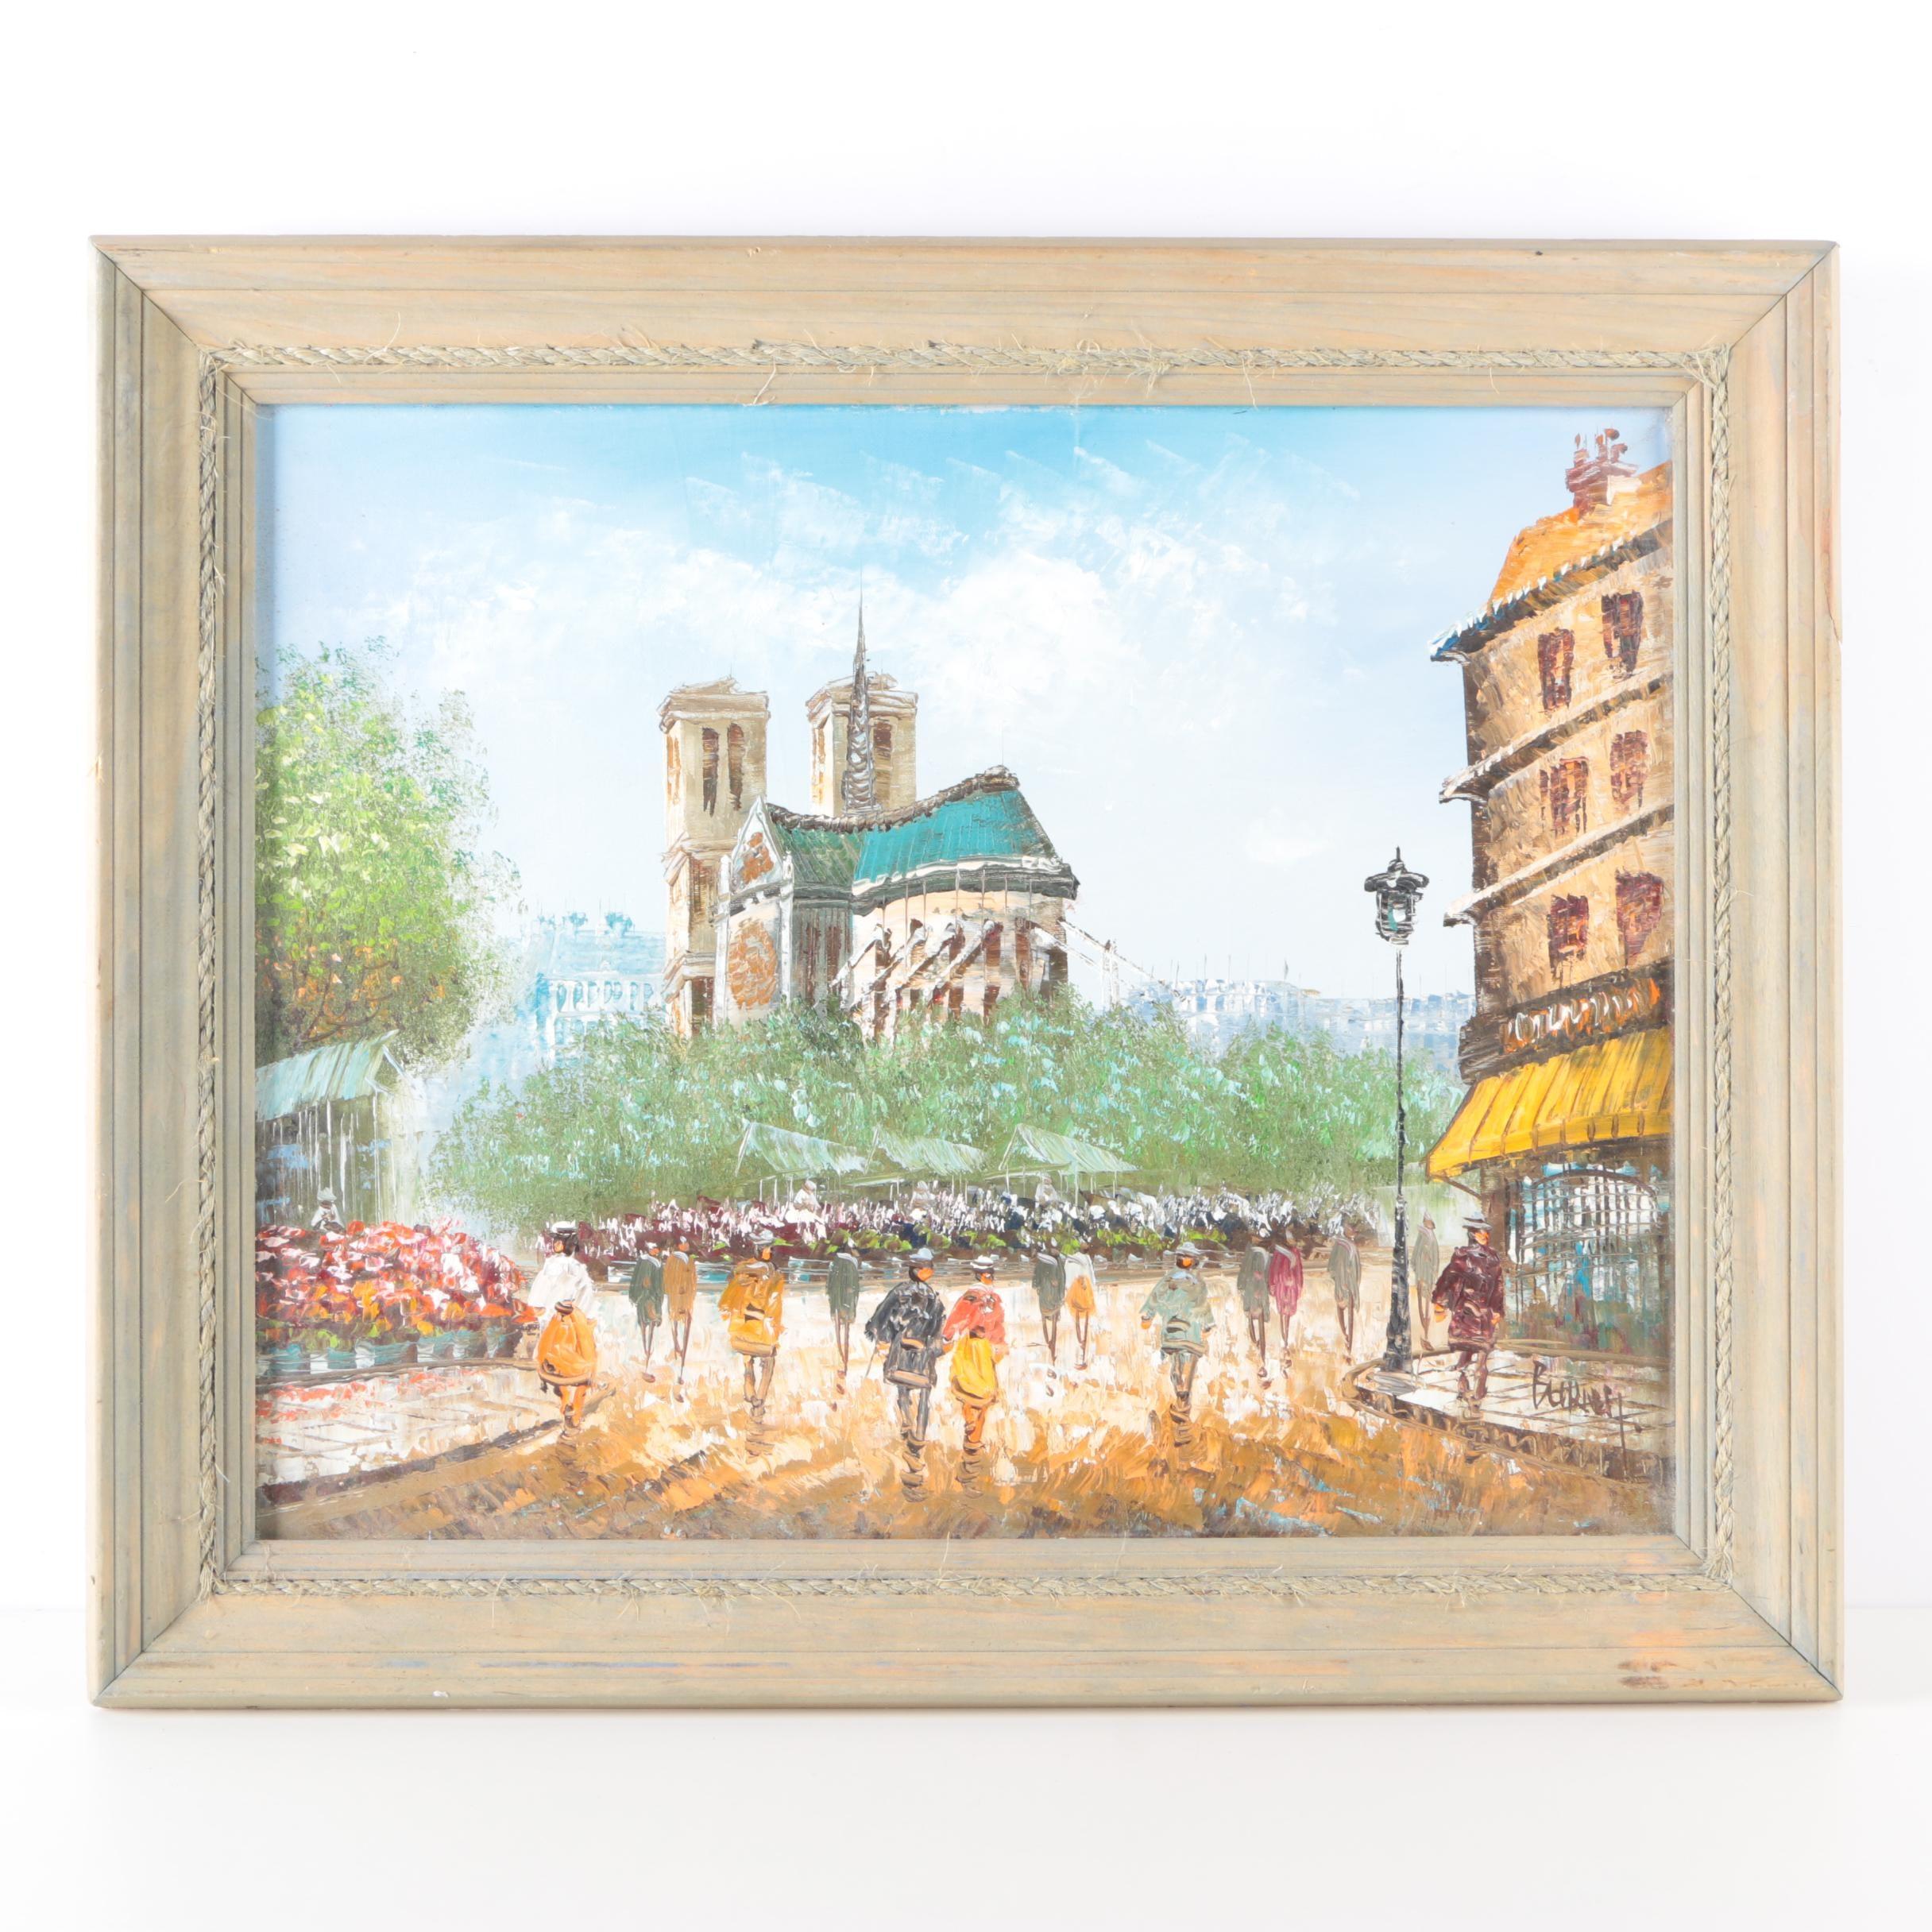 Burney Oil Painting on Canvas of Parisian Street